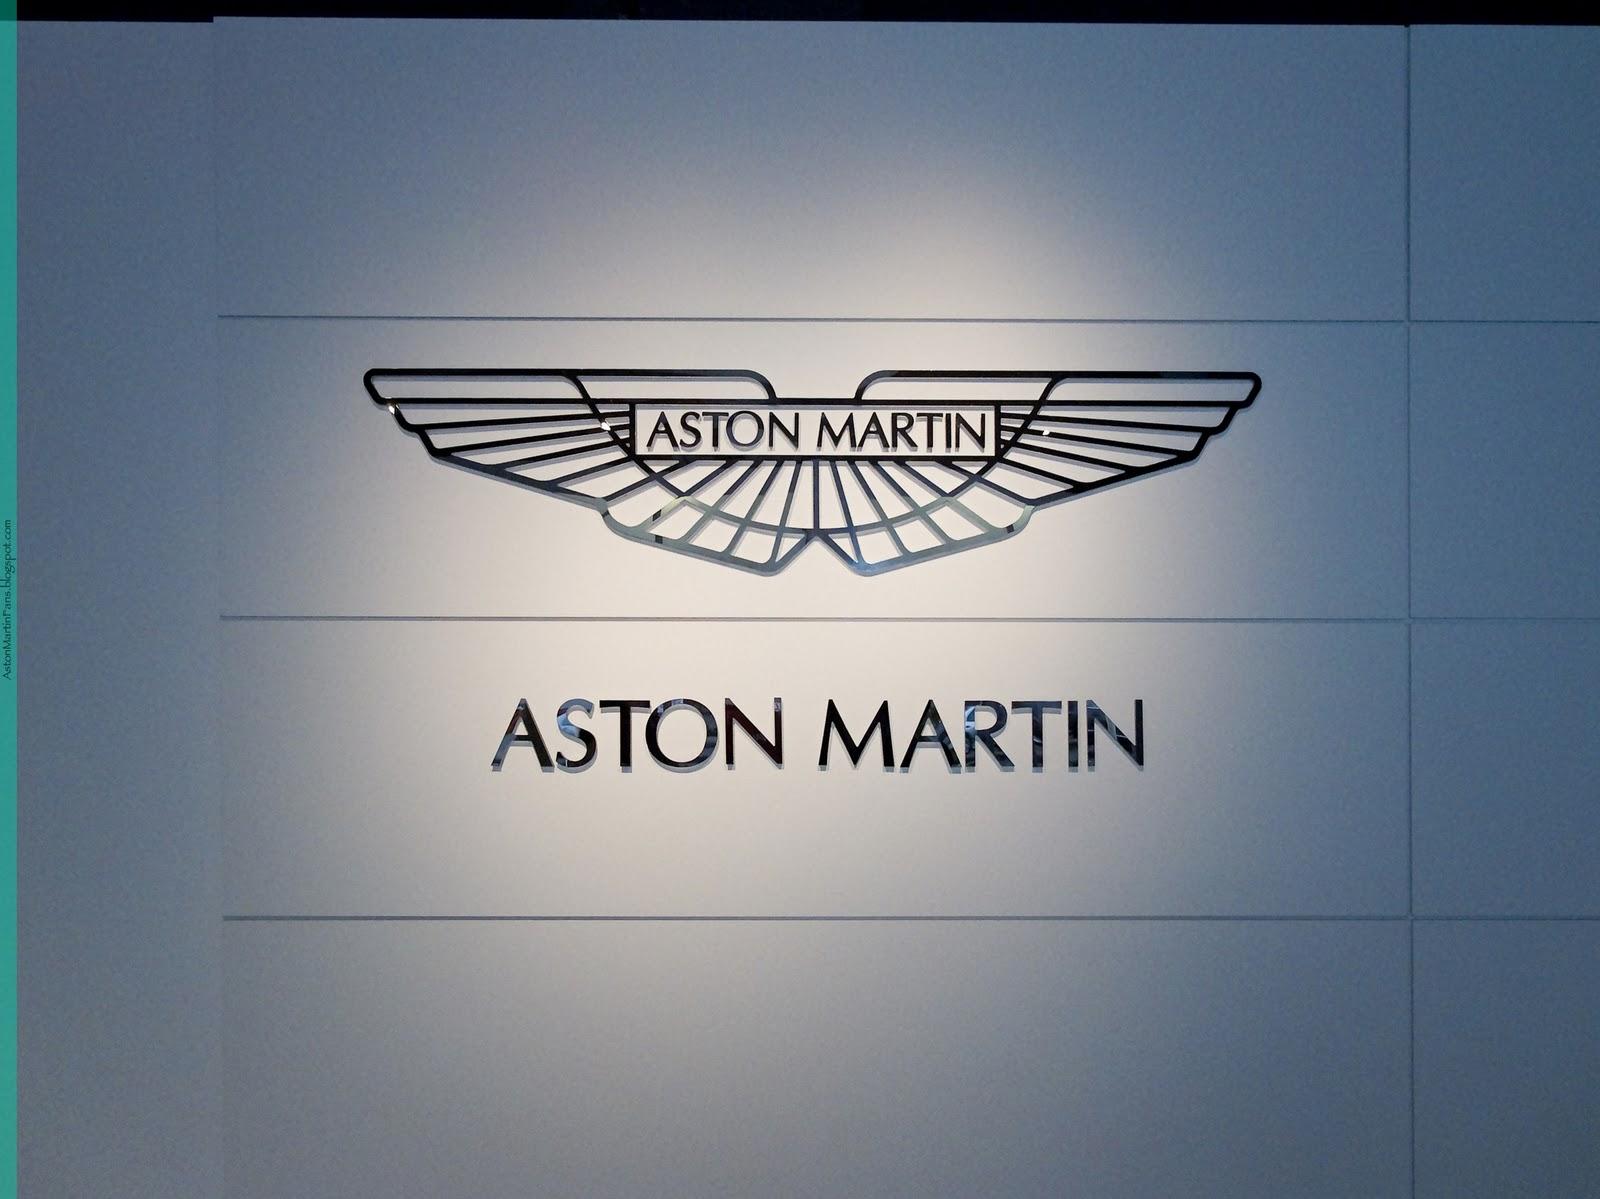 In Aston Martin Logo Font History Png Vector Wallpaper